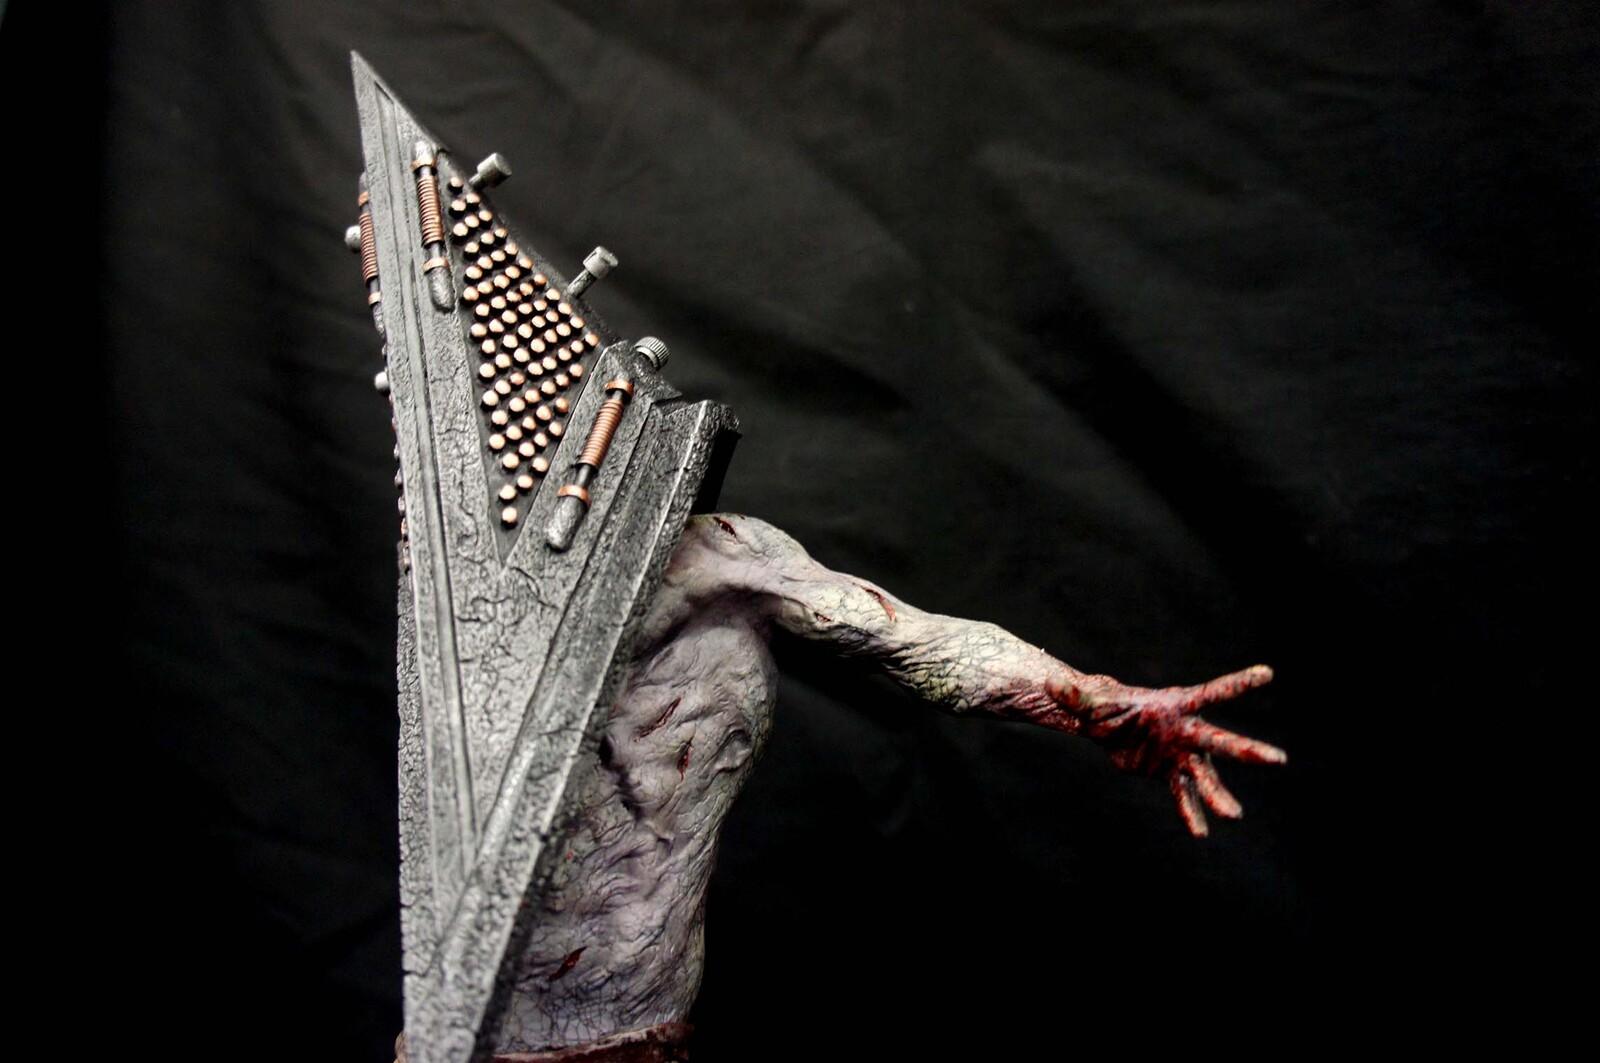 Silent Hill Pyramid Head (Bogeyman) Art Statue  https://www.solidart.club/